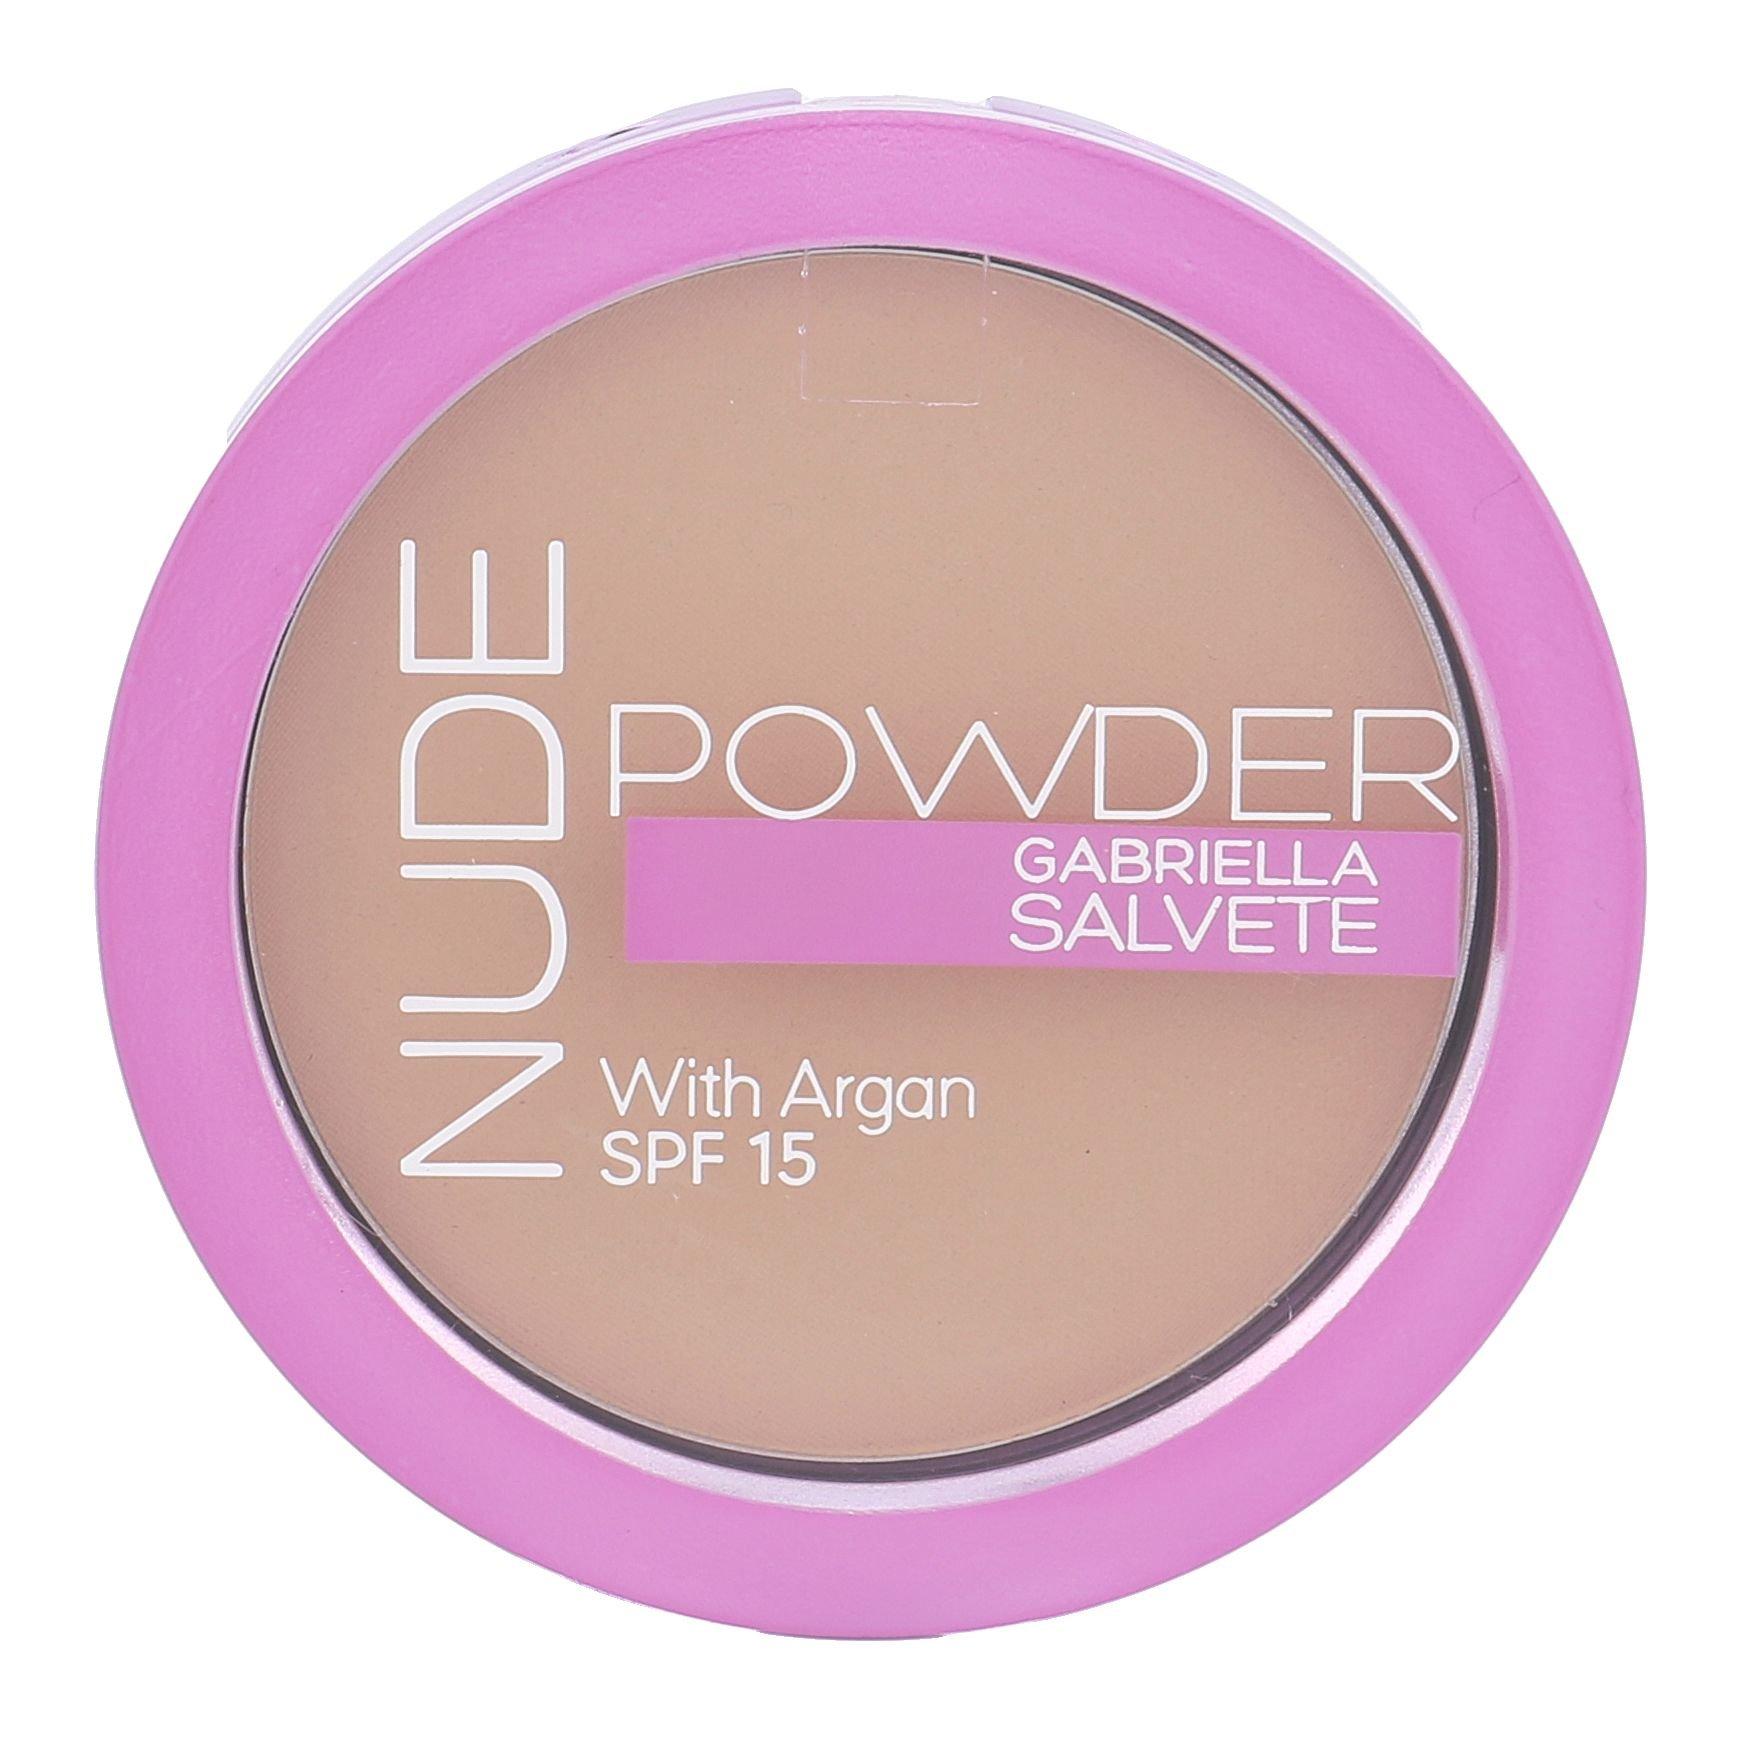 Gabriella Salvete Nude Powder SPF15 Cosmetic 8g 04 Nude Beige